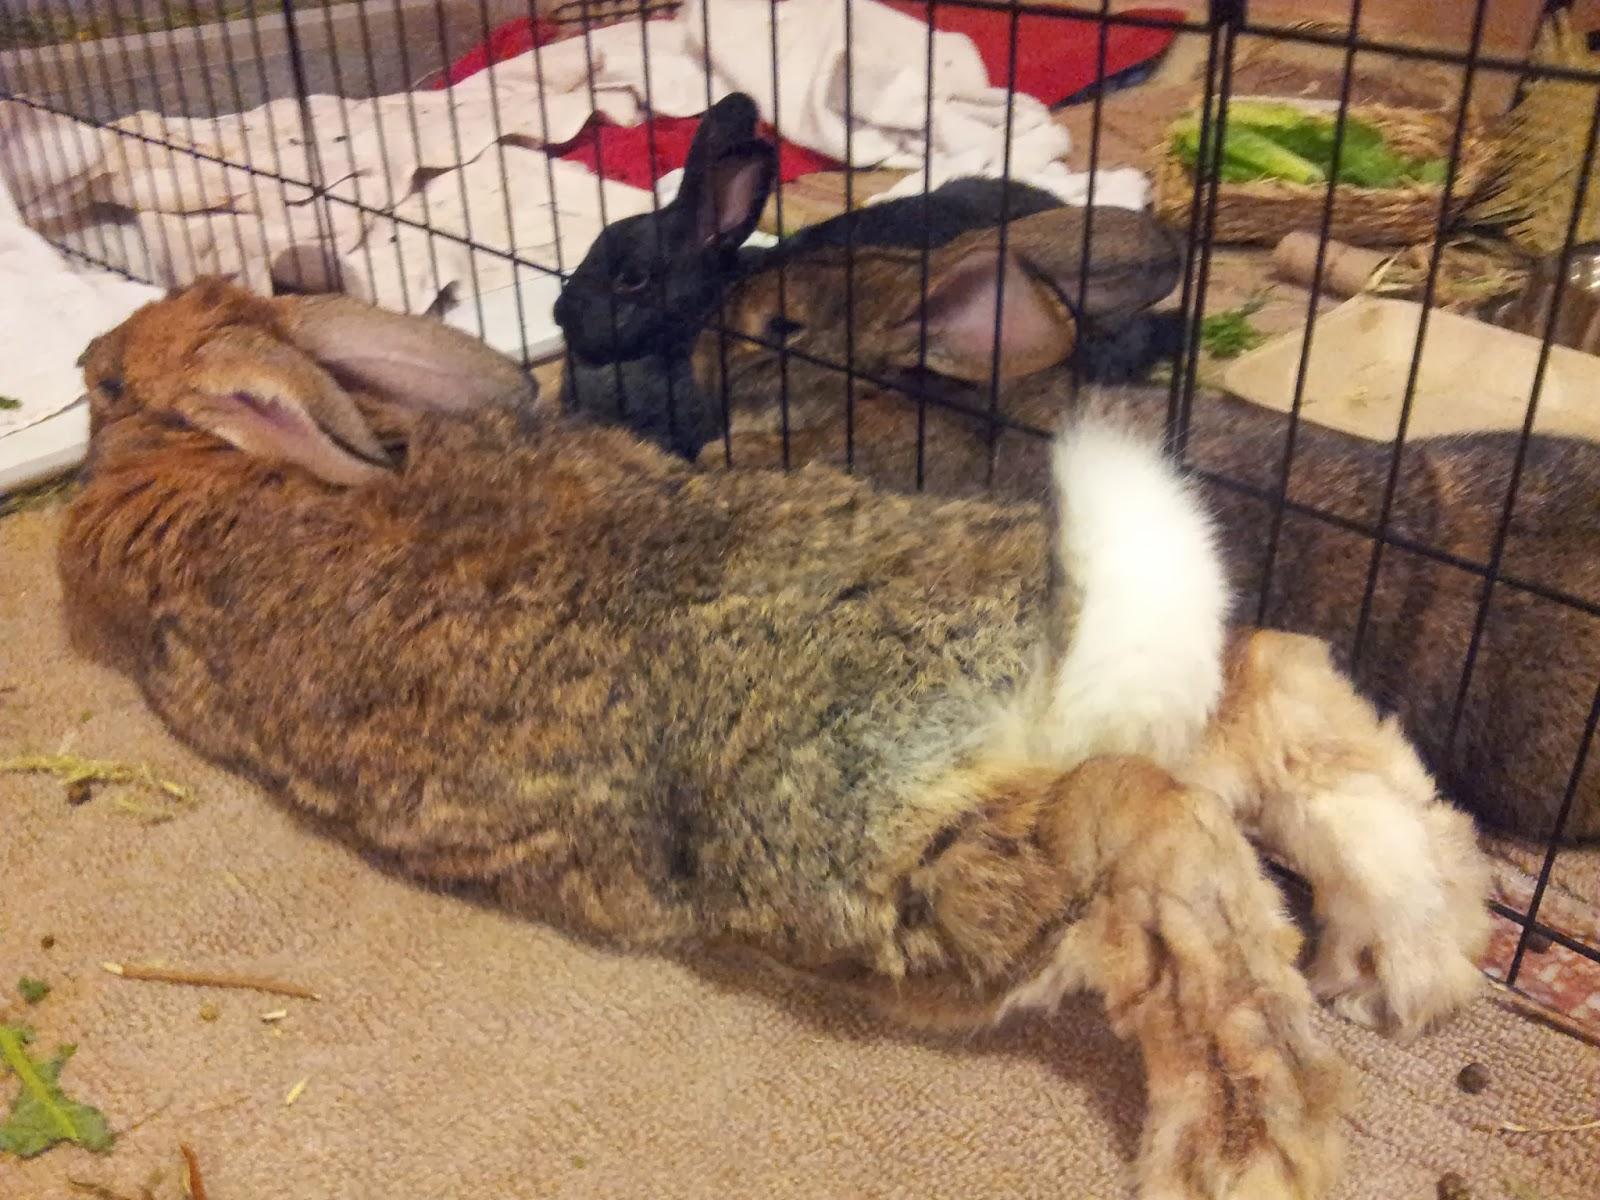 Rabbit Air Minusa2 Review